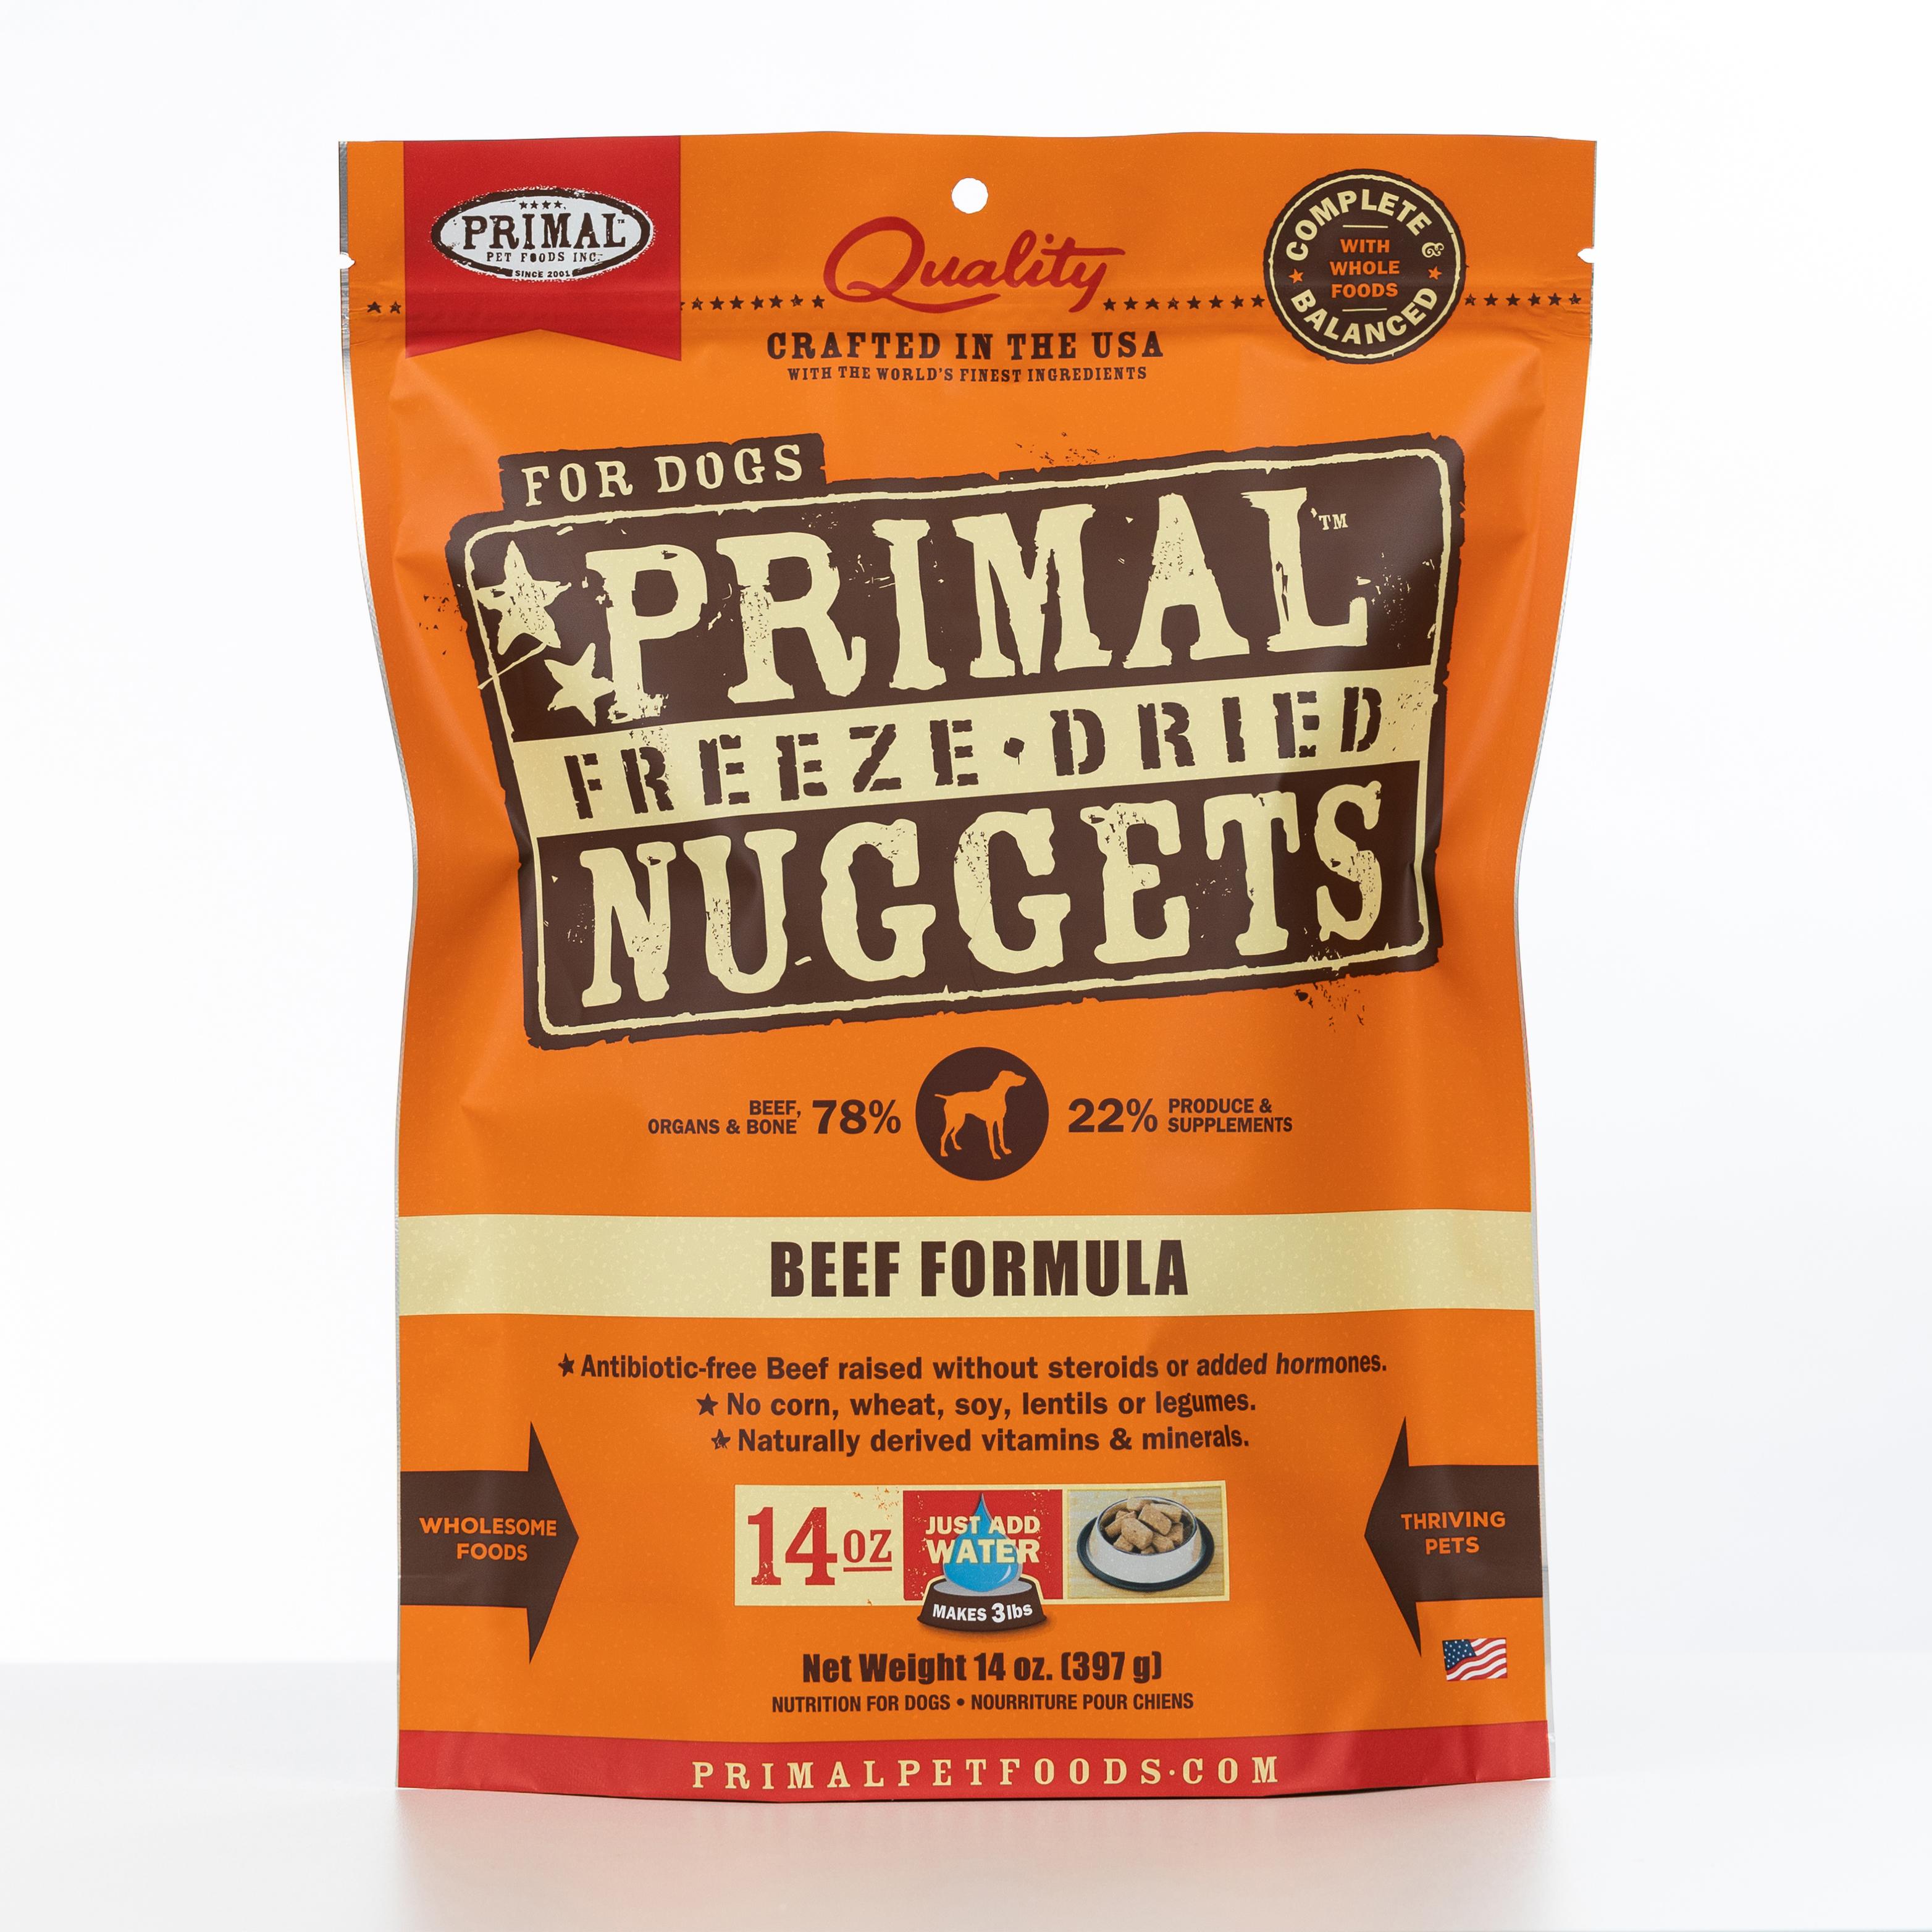 Primal Raw Freeze-Dried Nuggets Beef Formula Dog Food, 14-oz bag Size: 14-oz bag, Weights: 14ounces